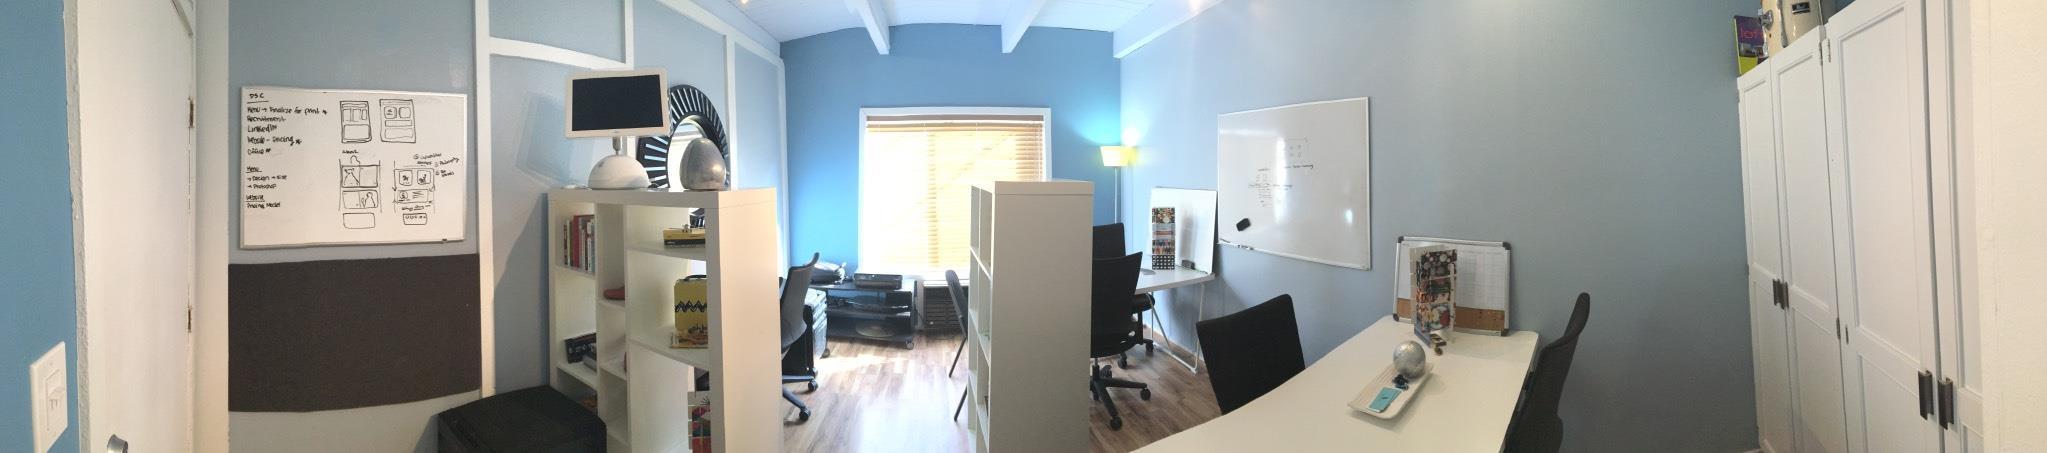 Co-Working Space in Studio City - Open Desk 1